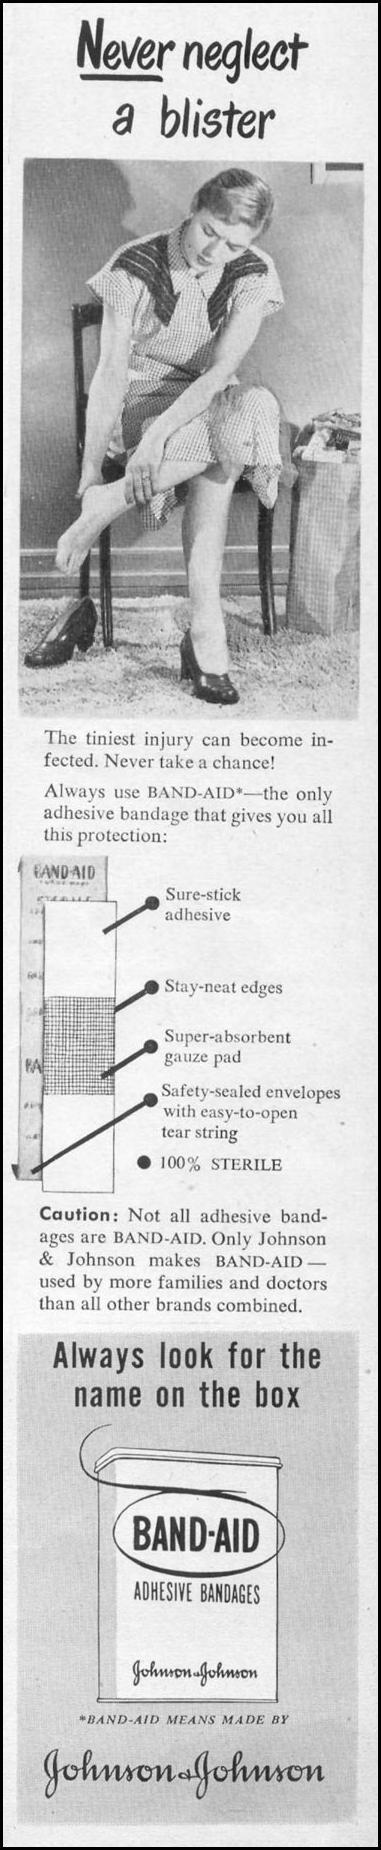 BAND AID BRAND ADHESIVE BANDAGES LIFE 06/05/1950 p. 59